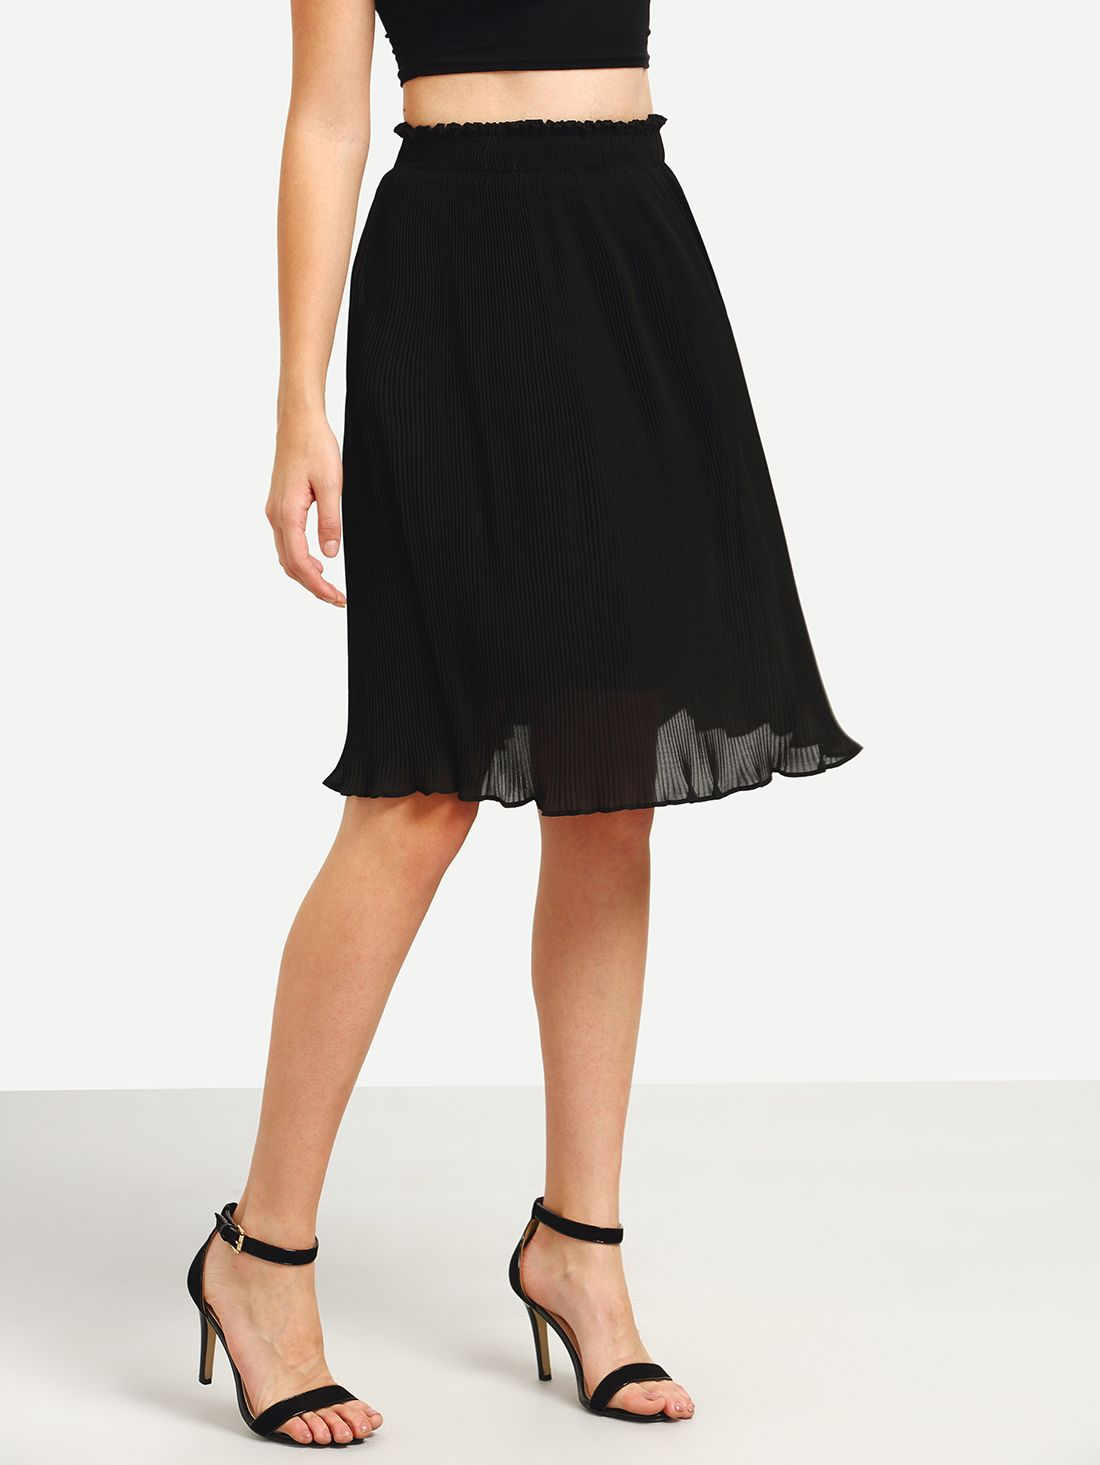 Ruffled Pleated Midi Skirt - Black | Shops, Skirts and Midi skirts